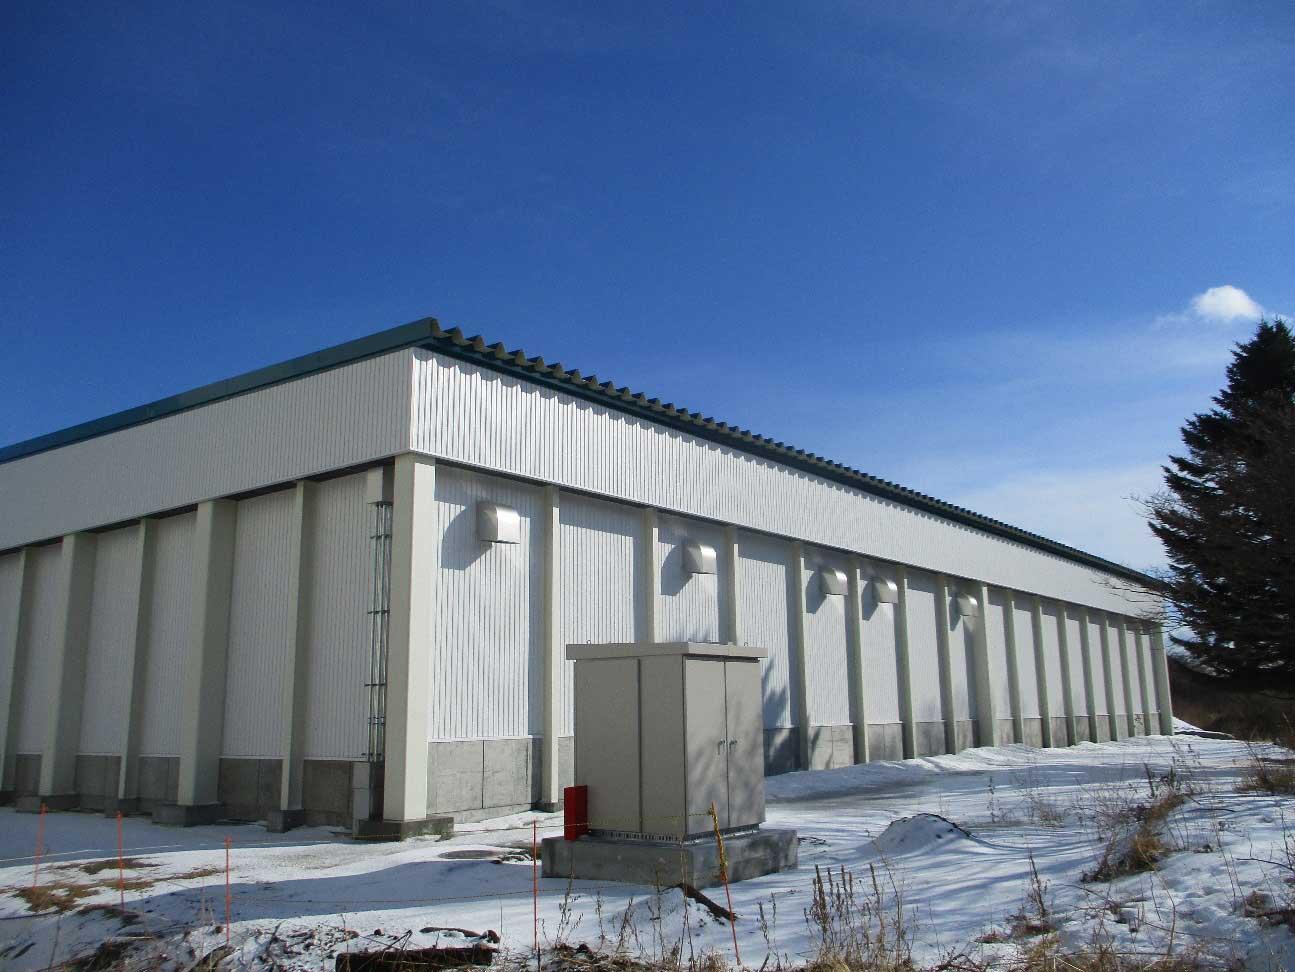 とまこまい広域農業協同組合 厚真地区農産物集出荷貯蔵施設 新築工事